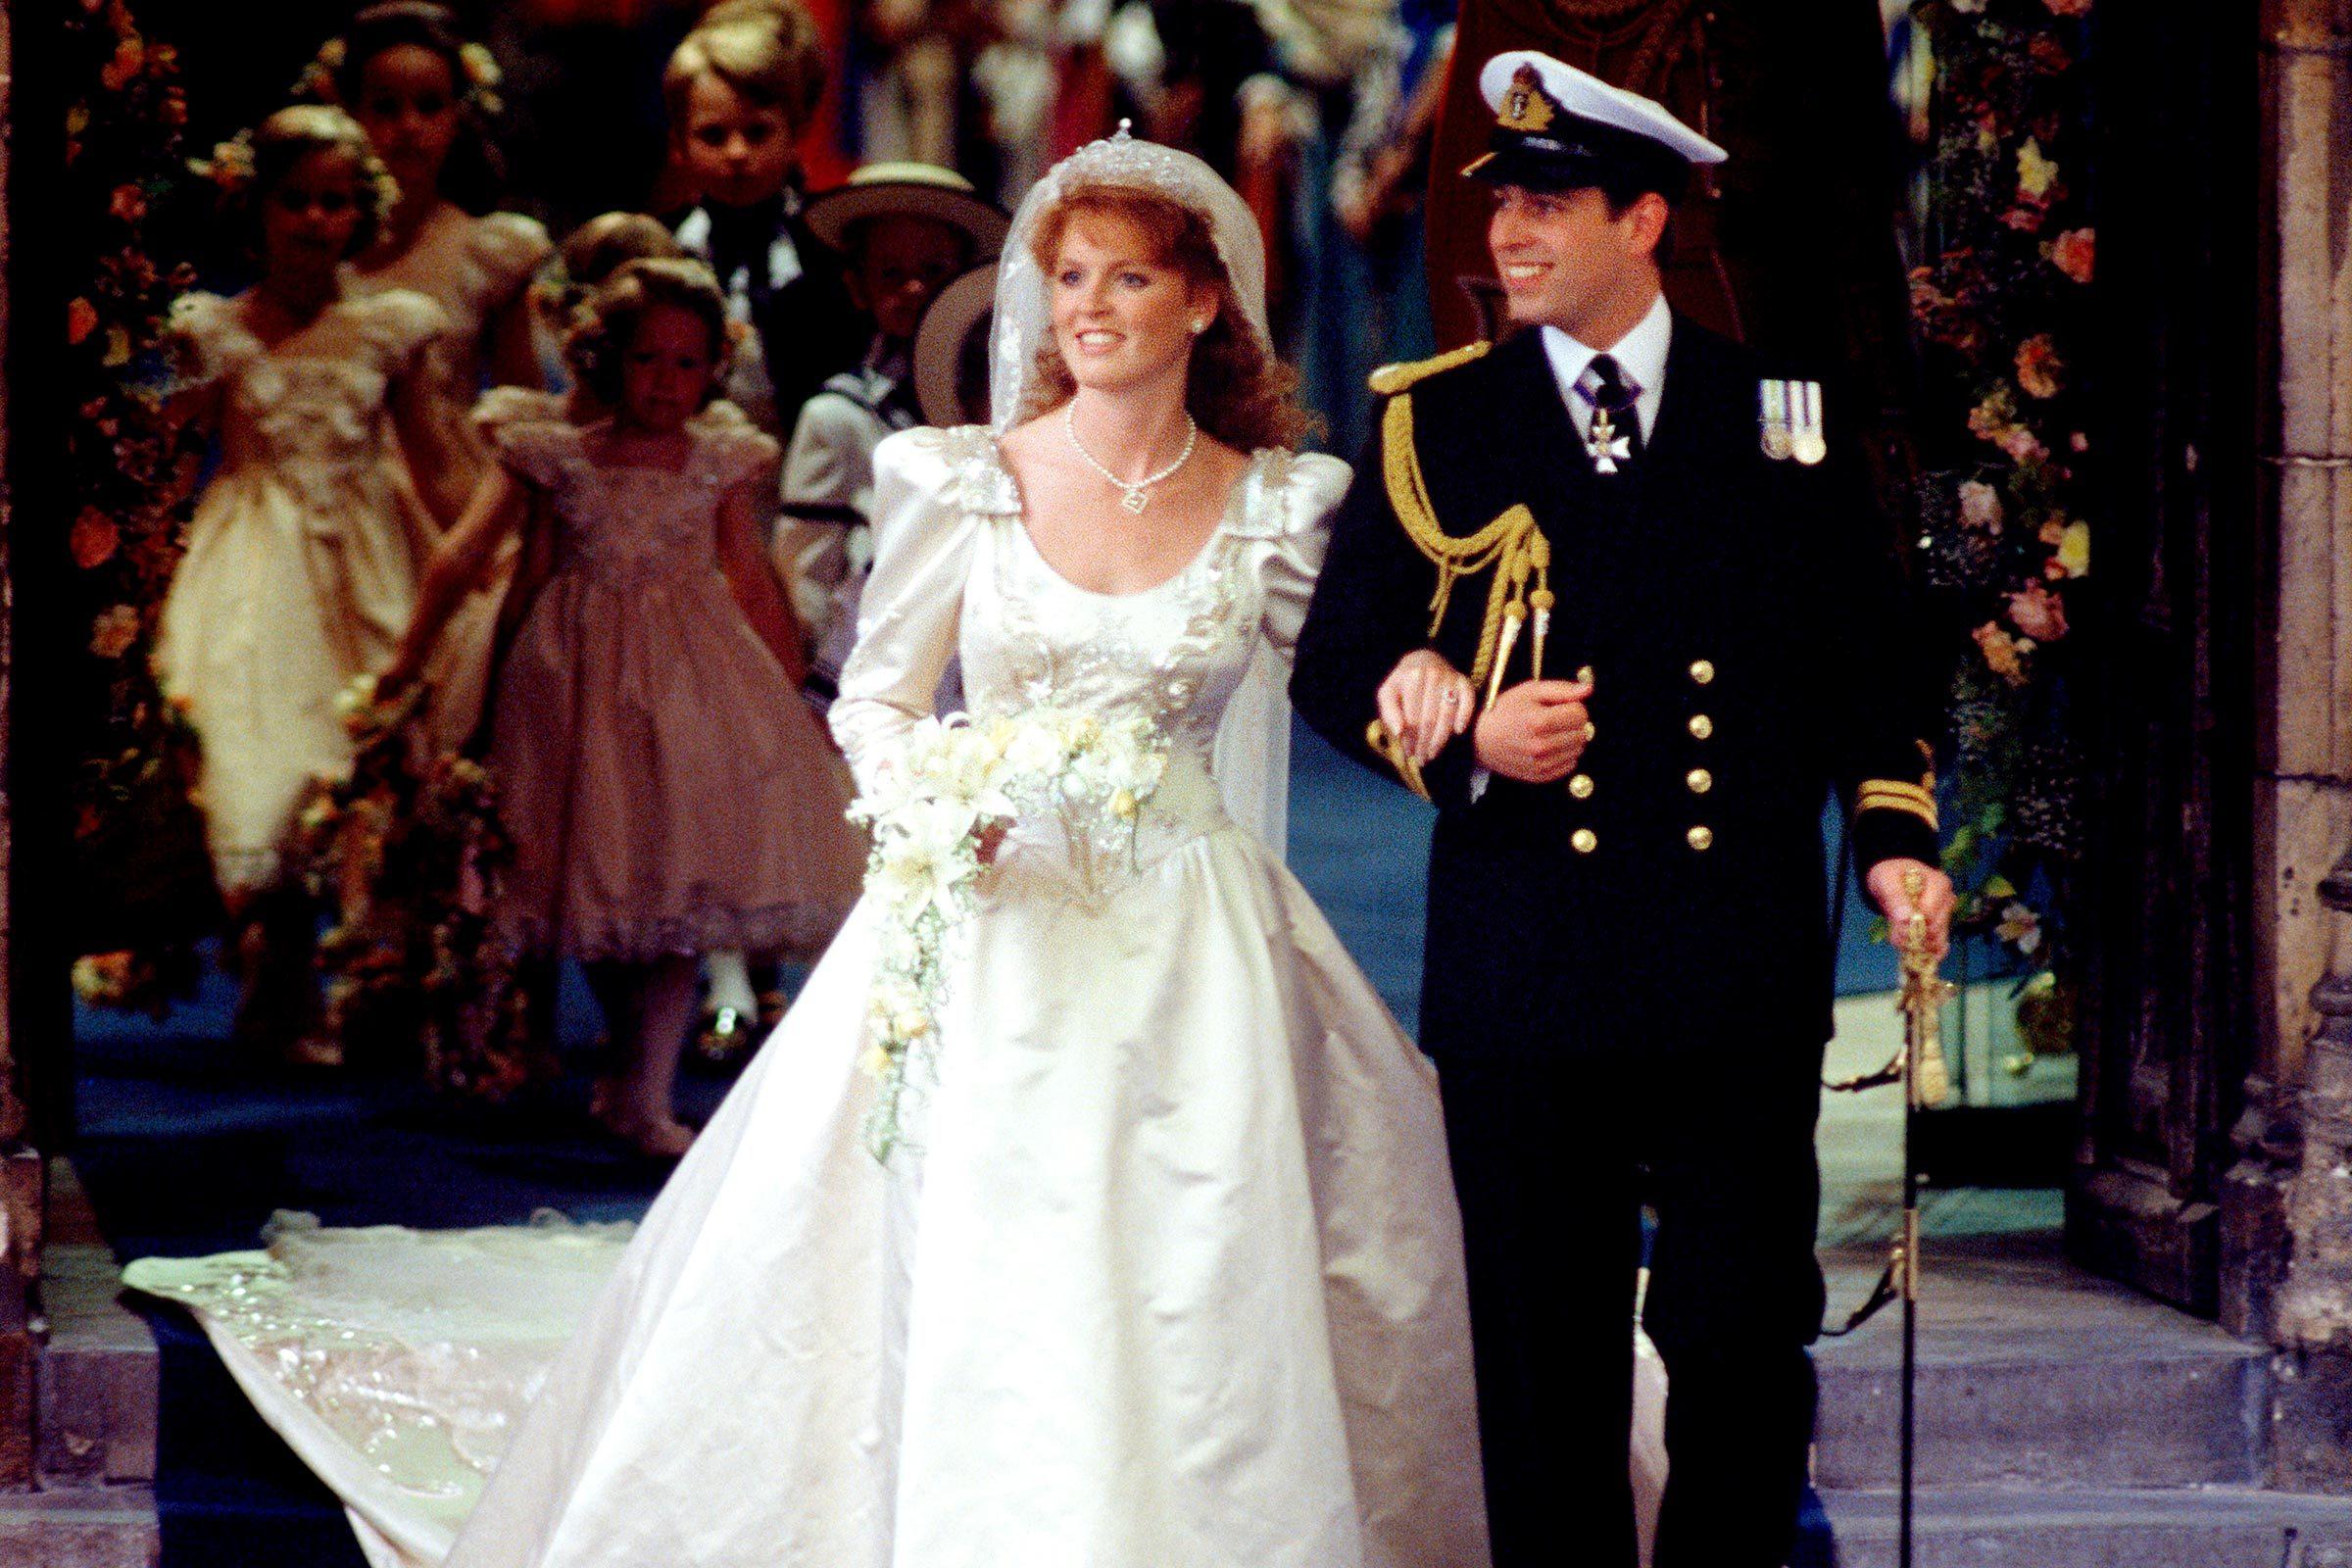 Sarah Ferguson and Prince Andrew Wedding